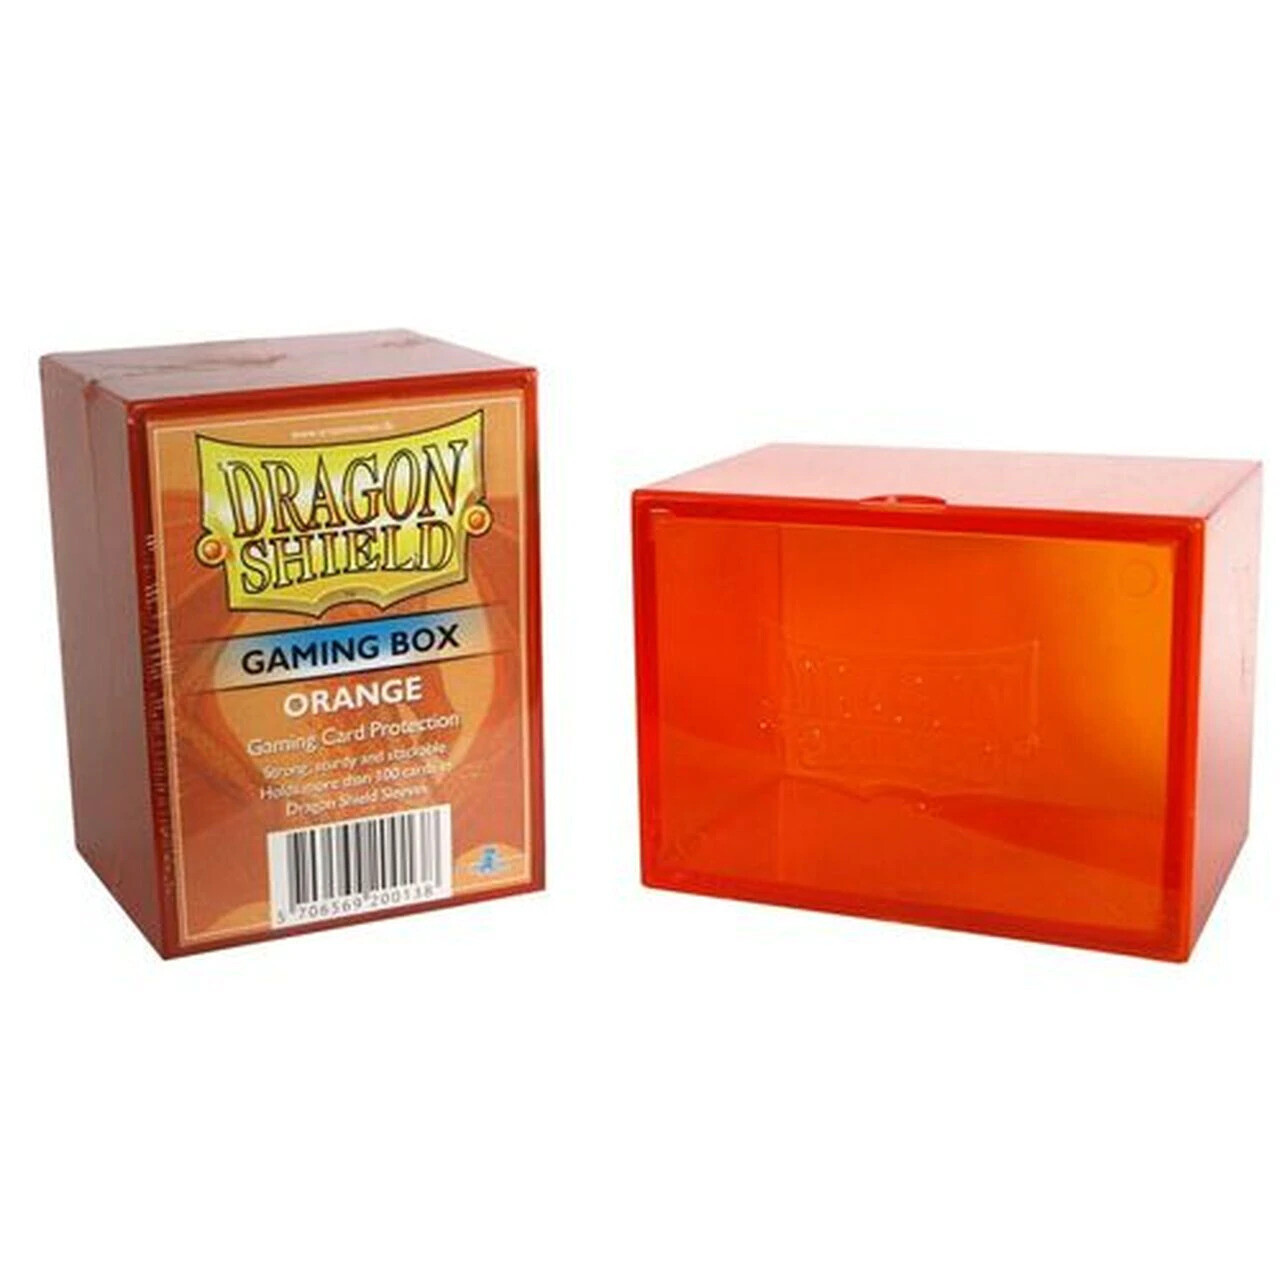 Deck Box: Dragon Shield: Gaming Box Orange